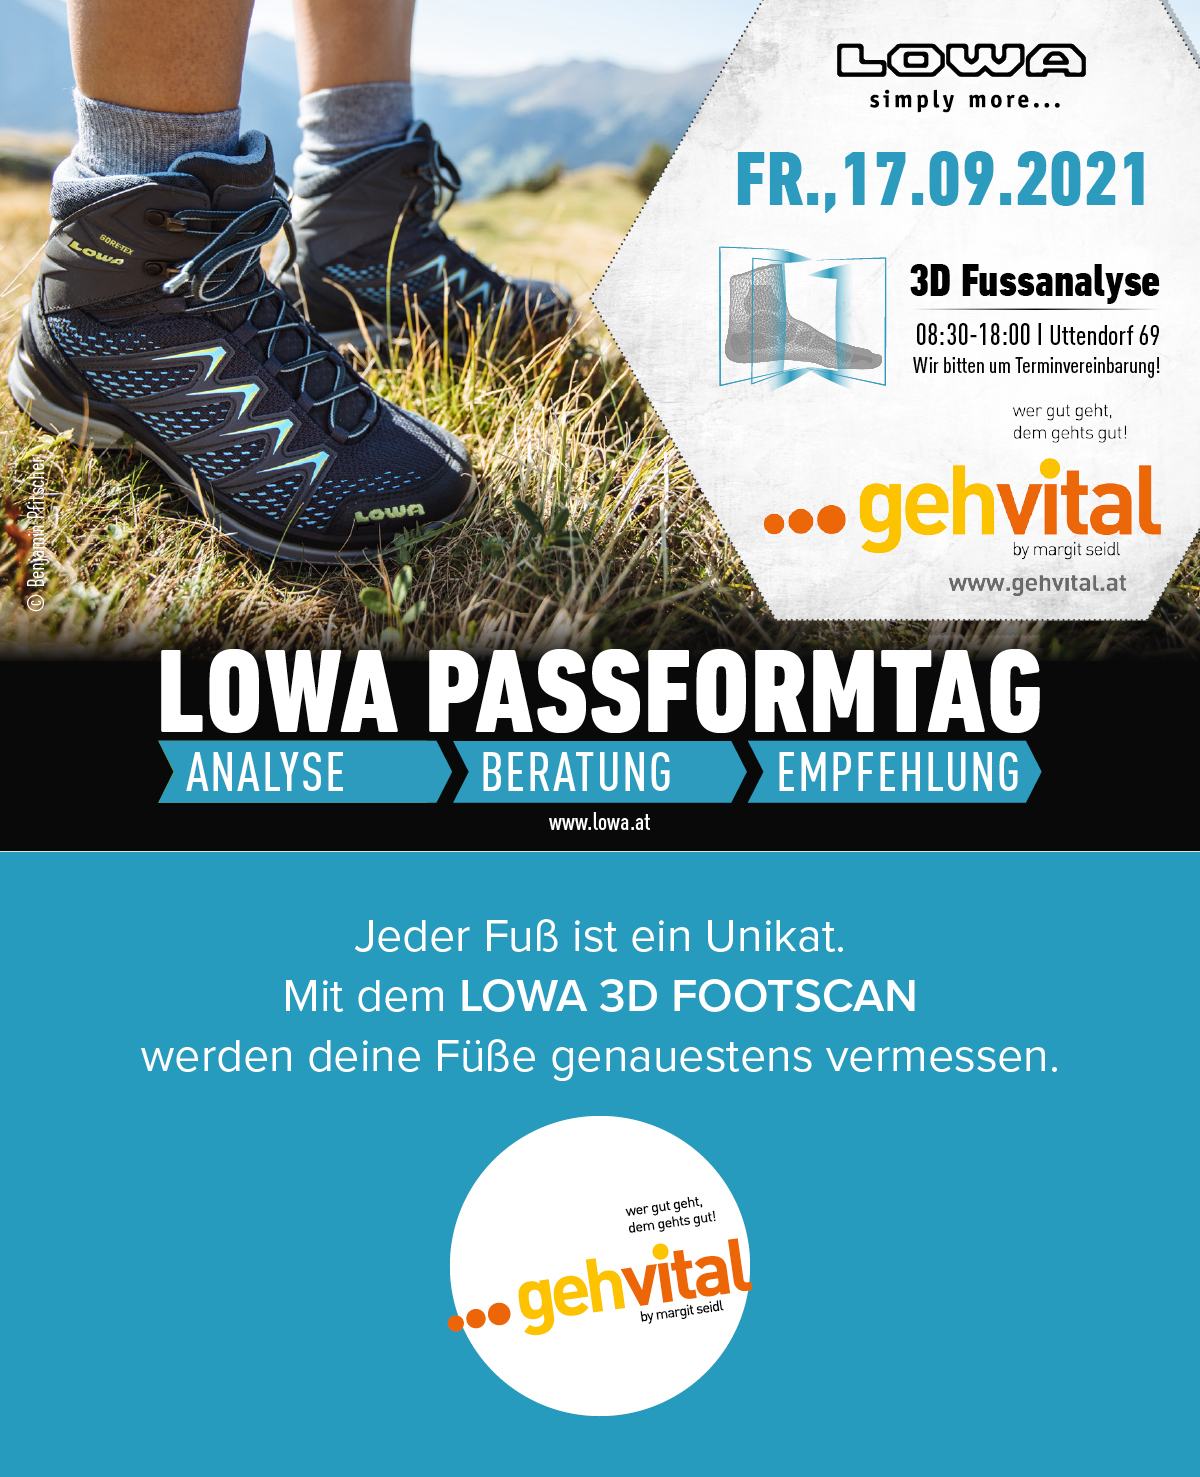 LOWA Passformtag